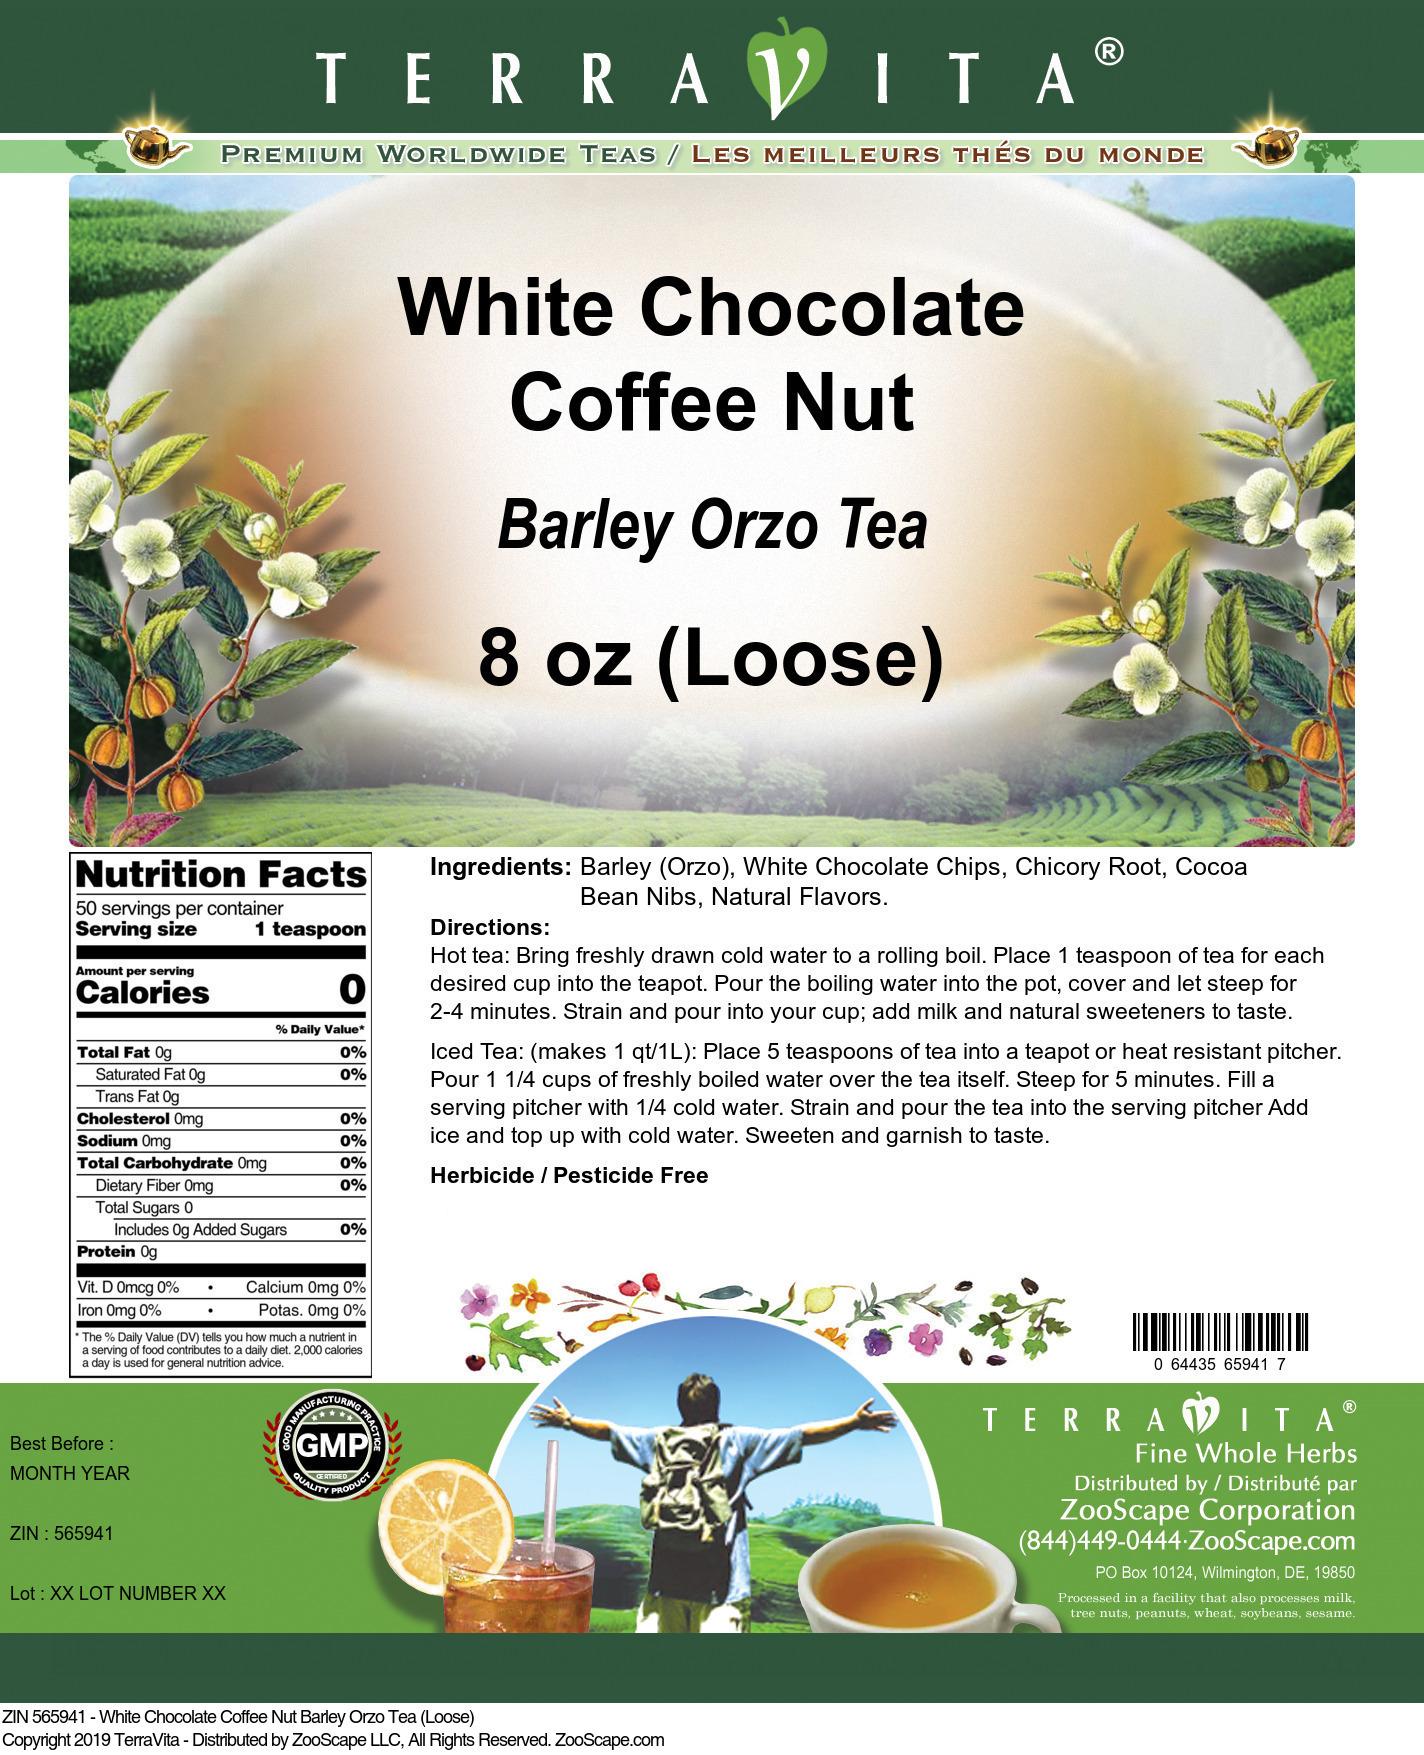 White Chocolate Coffee Nut Barley Orzo Tea (Loose)